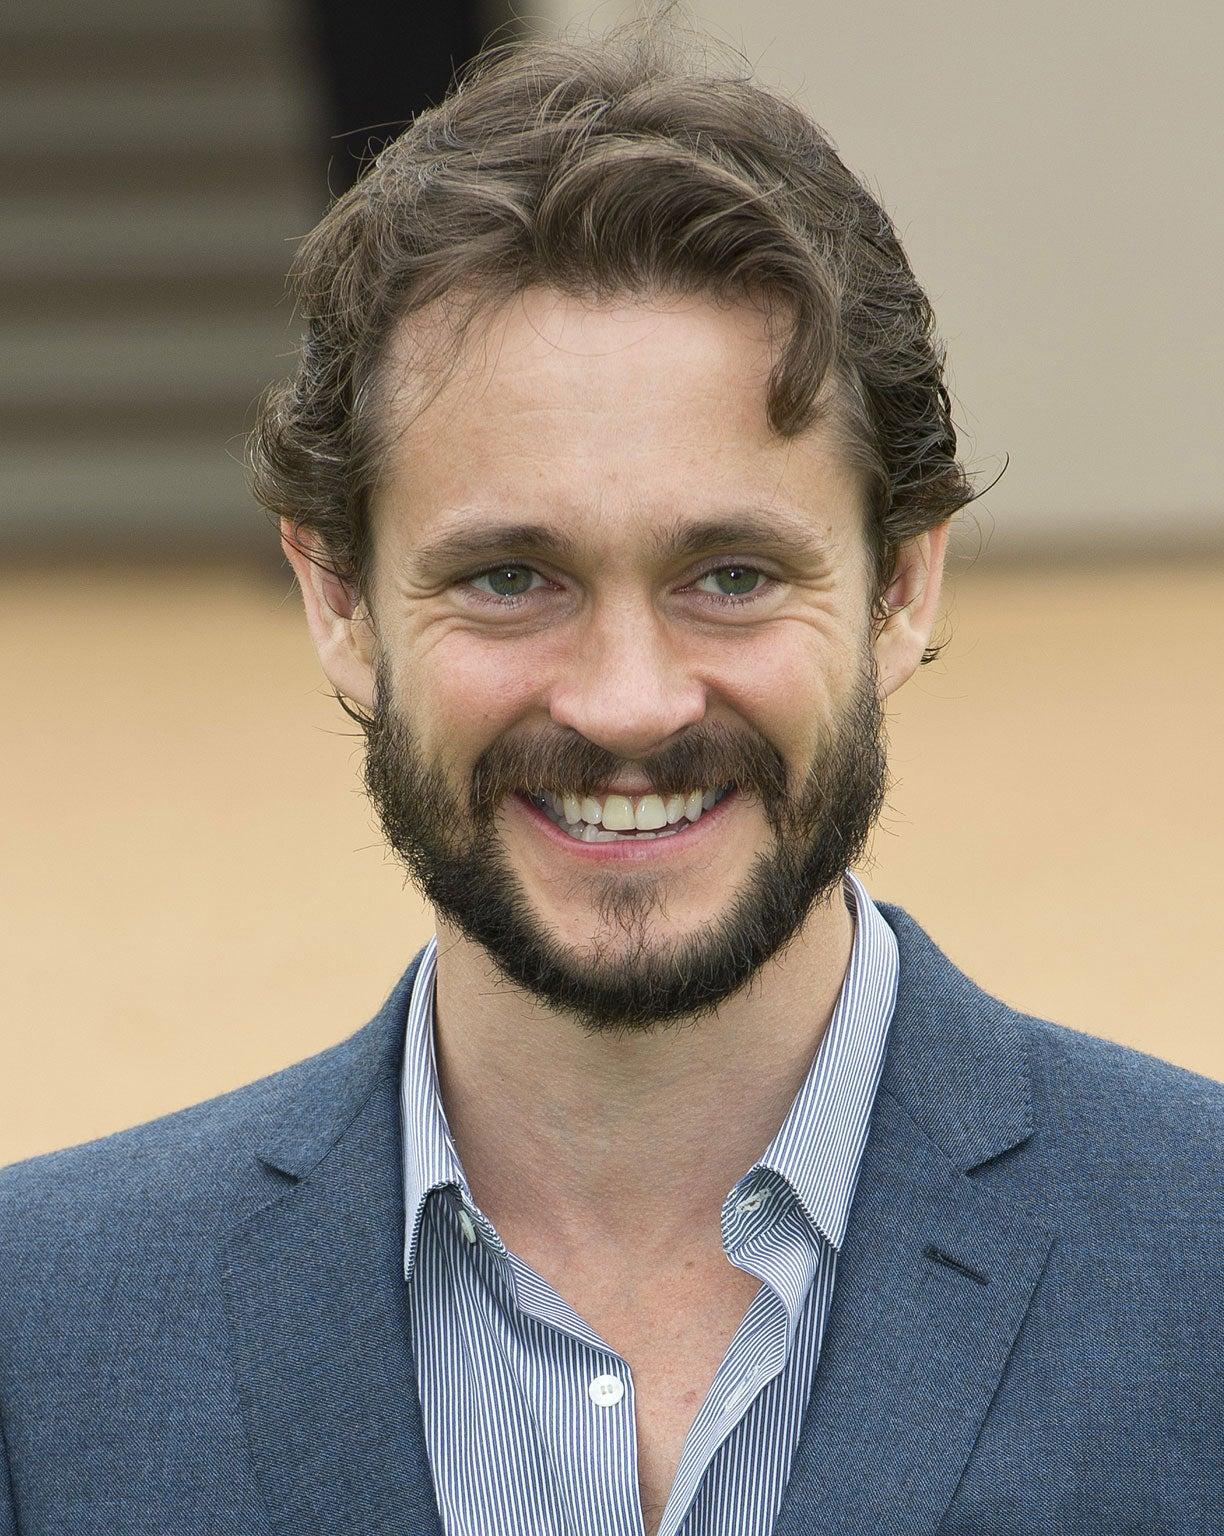 The Ideal Hair To Beard Length Ratio According To Top London